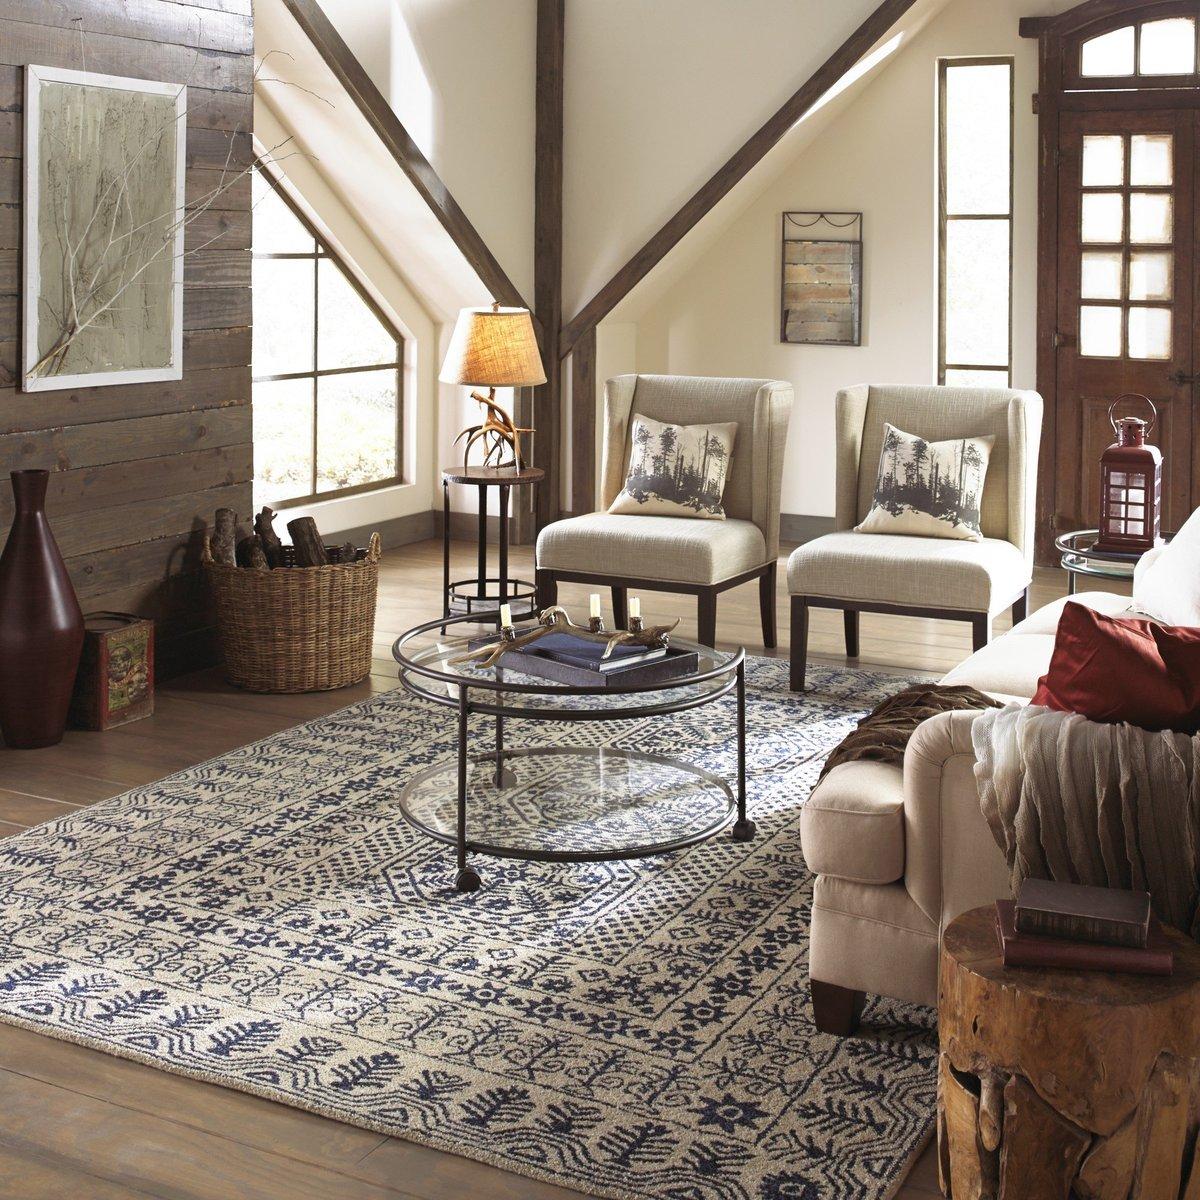 Modern Rustic Cozy Living Room Ideas